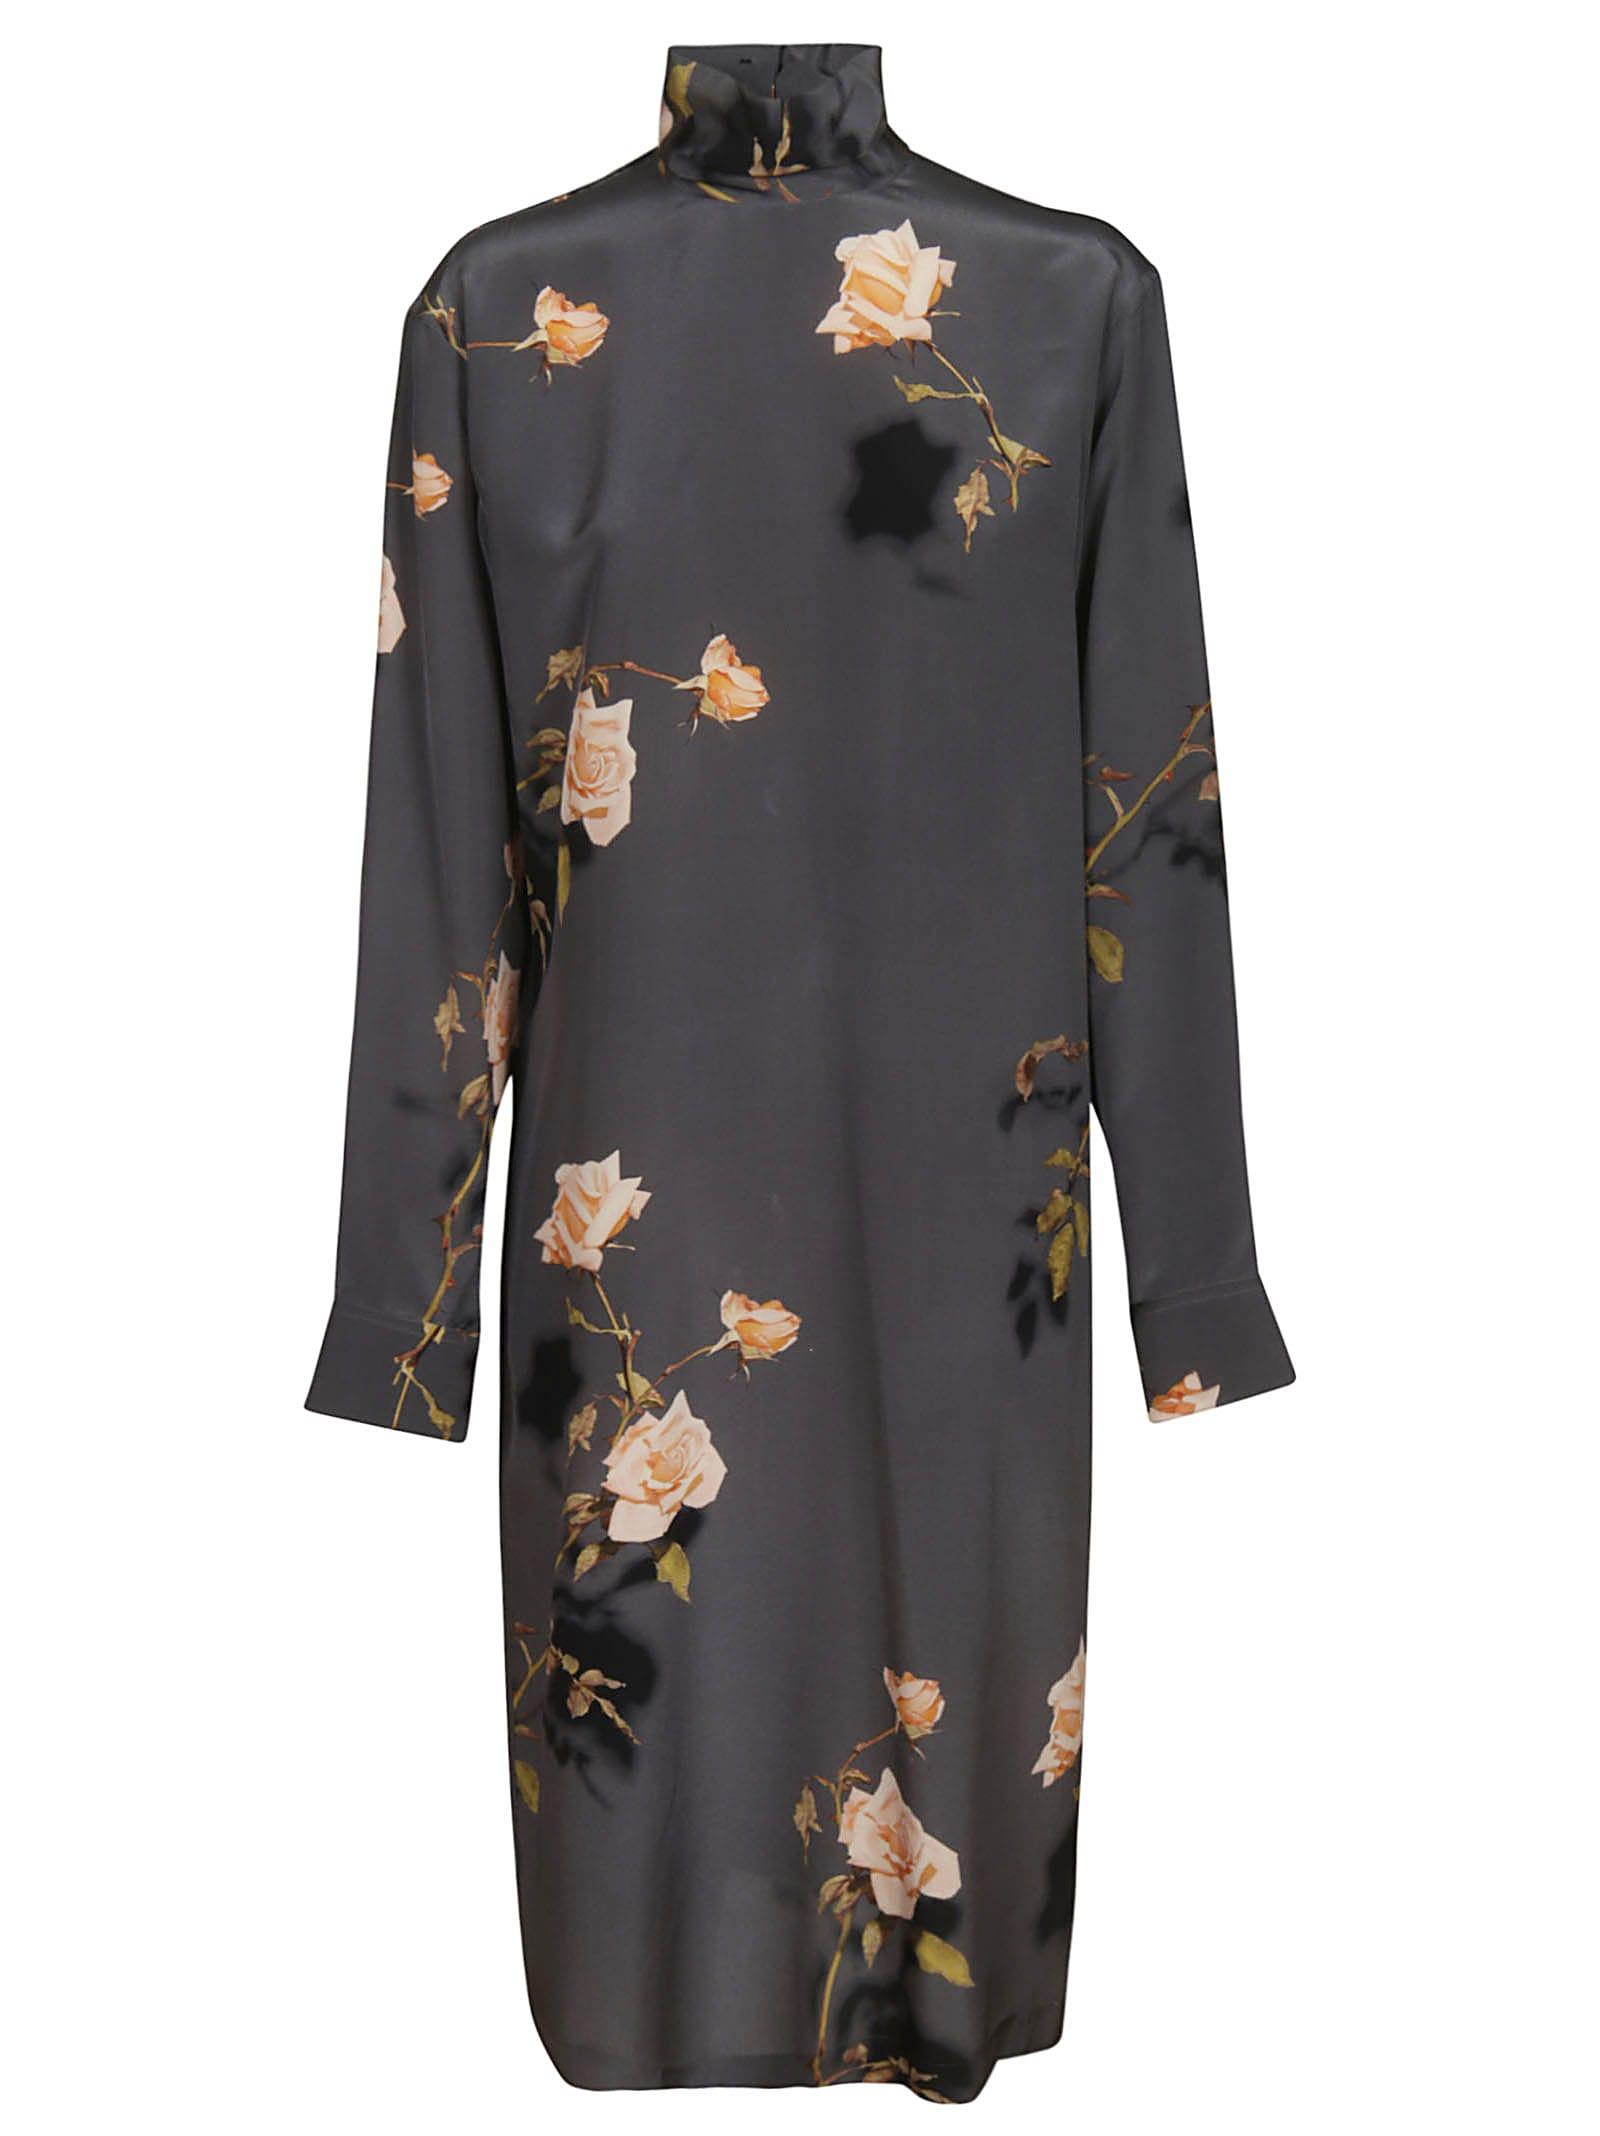 Dries Van Noten Rose Print Dress